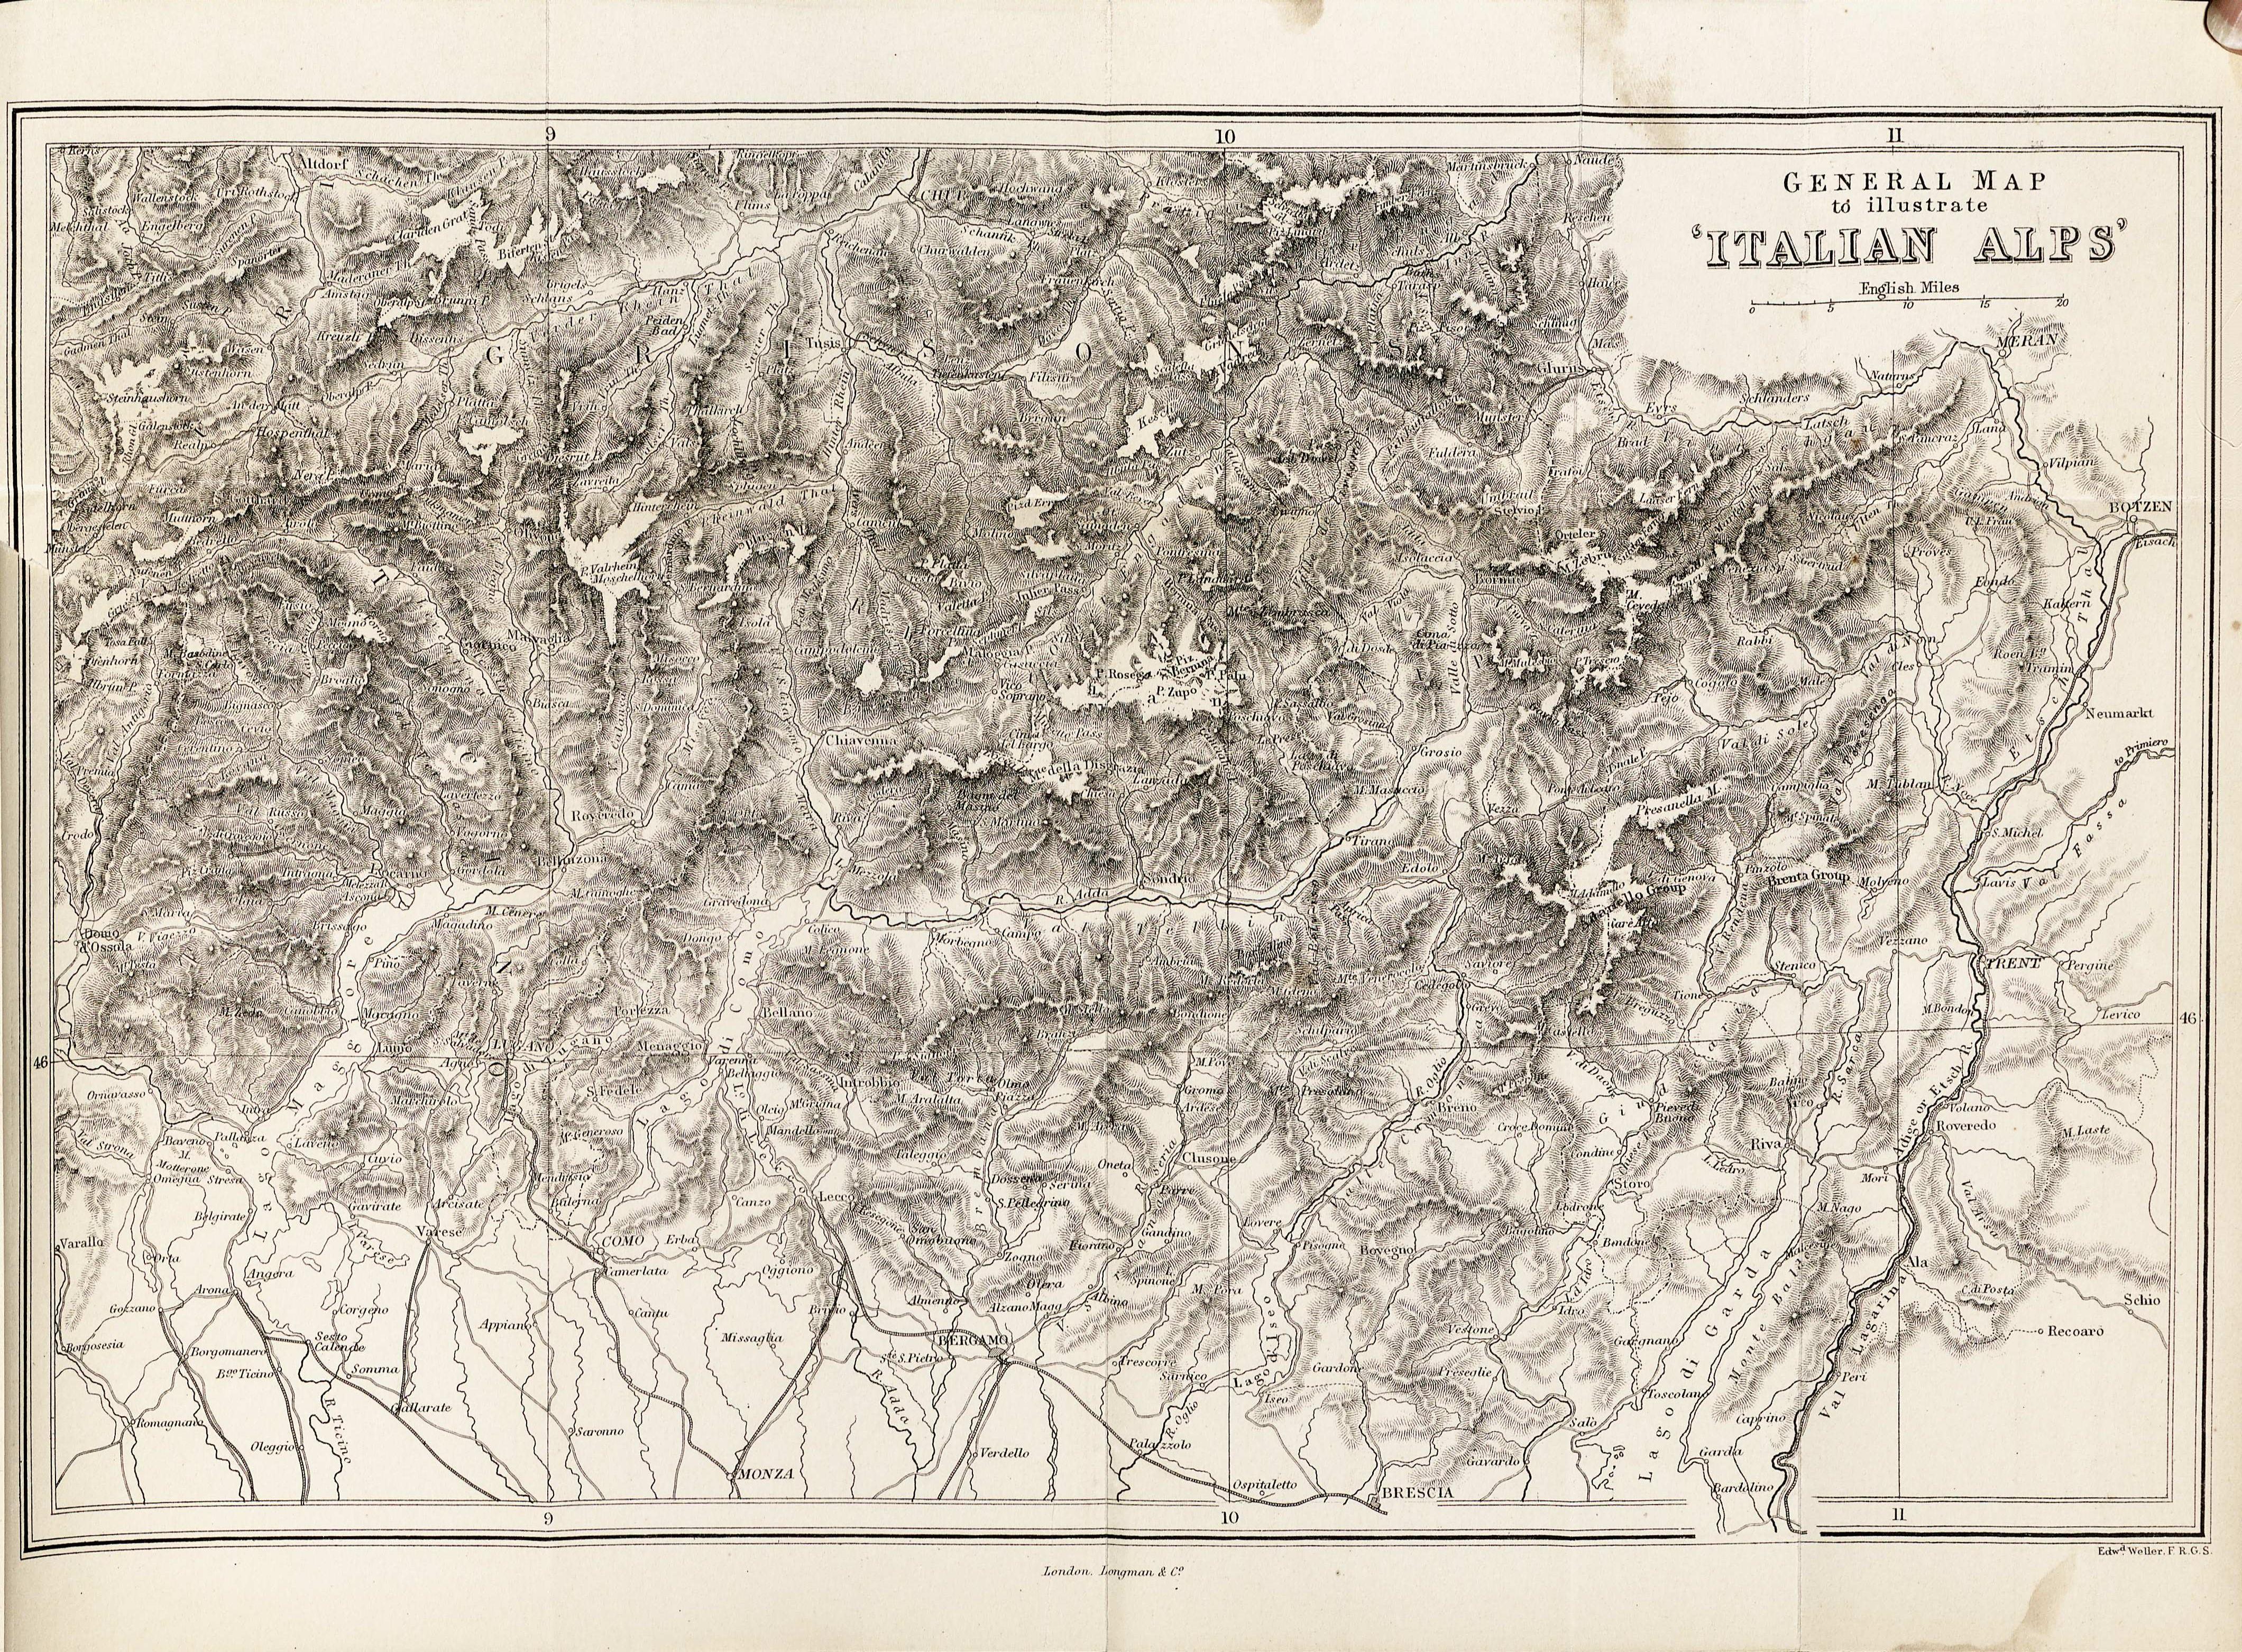 File:General map to illustrate Italian Alps (c 1875).jpg - Wikimedia on